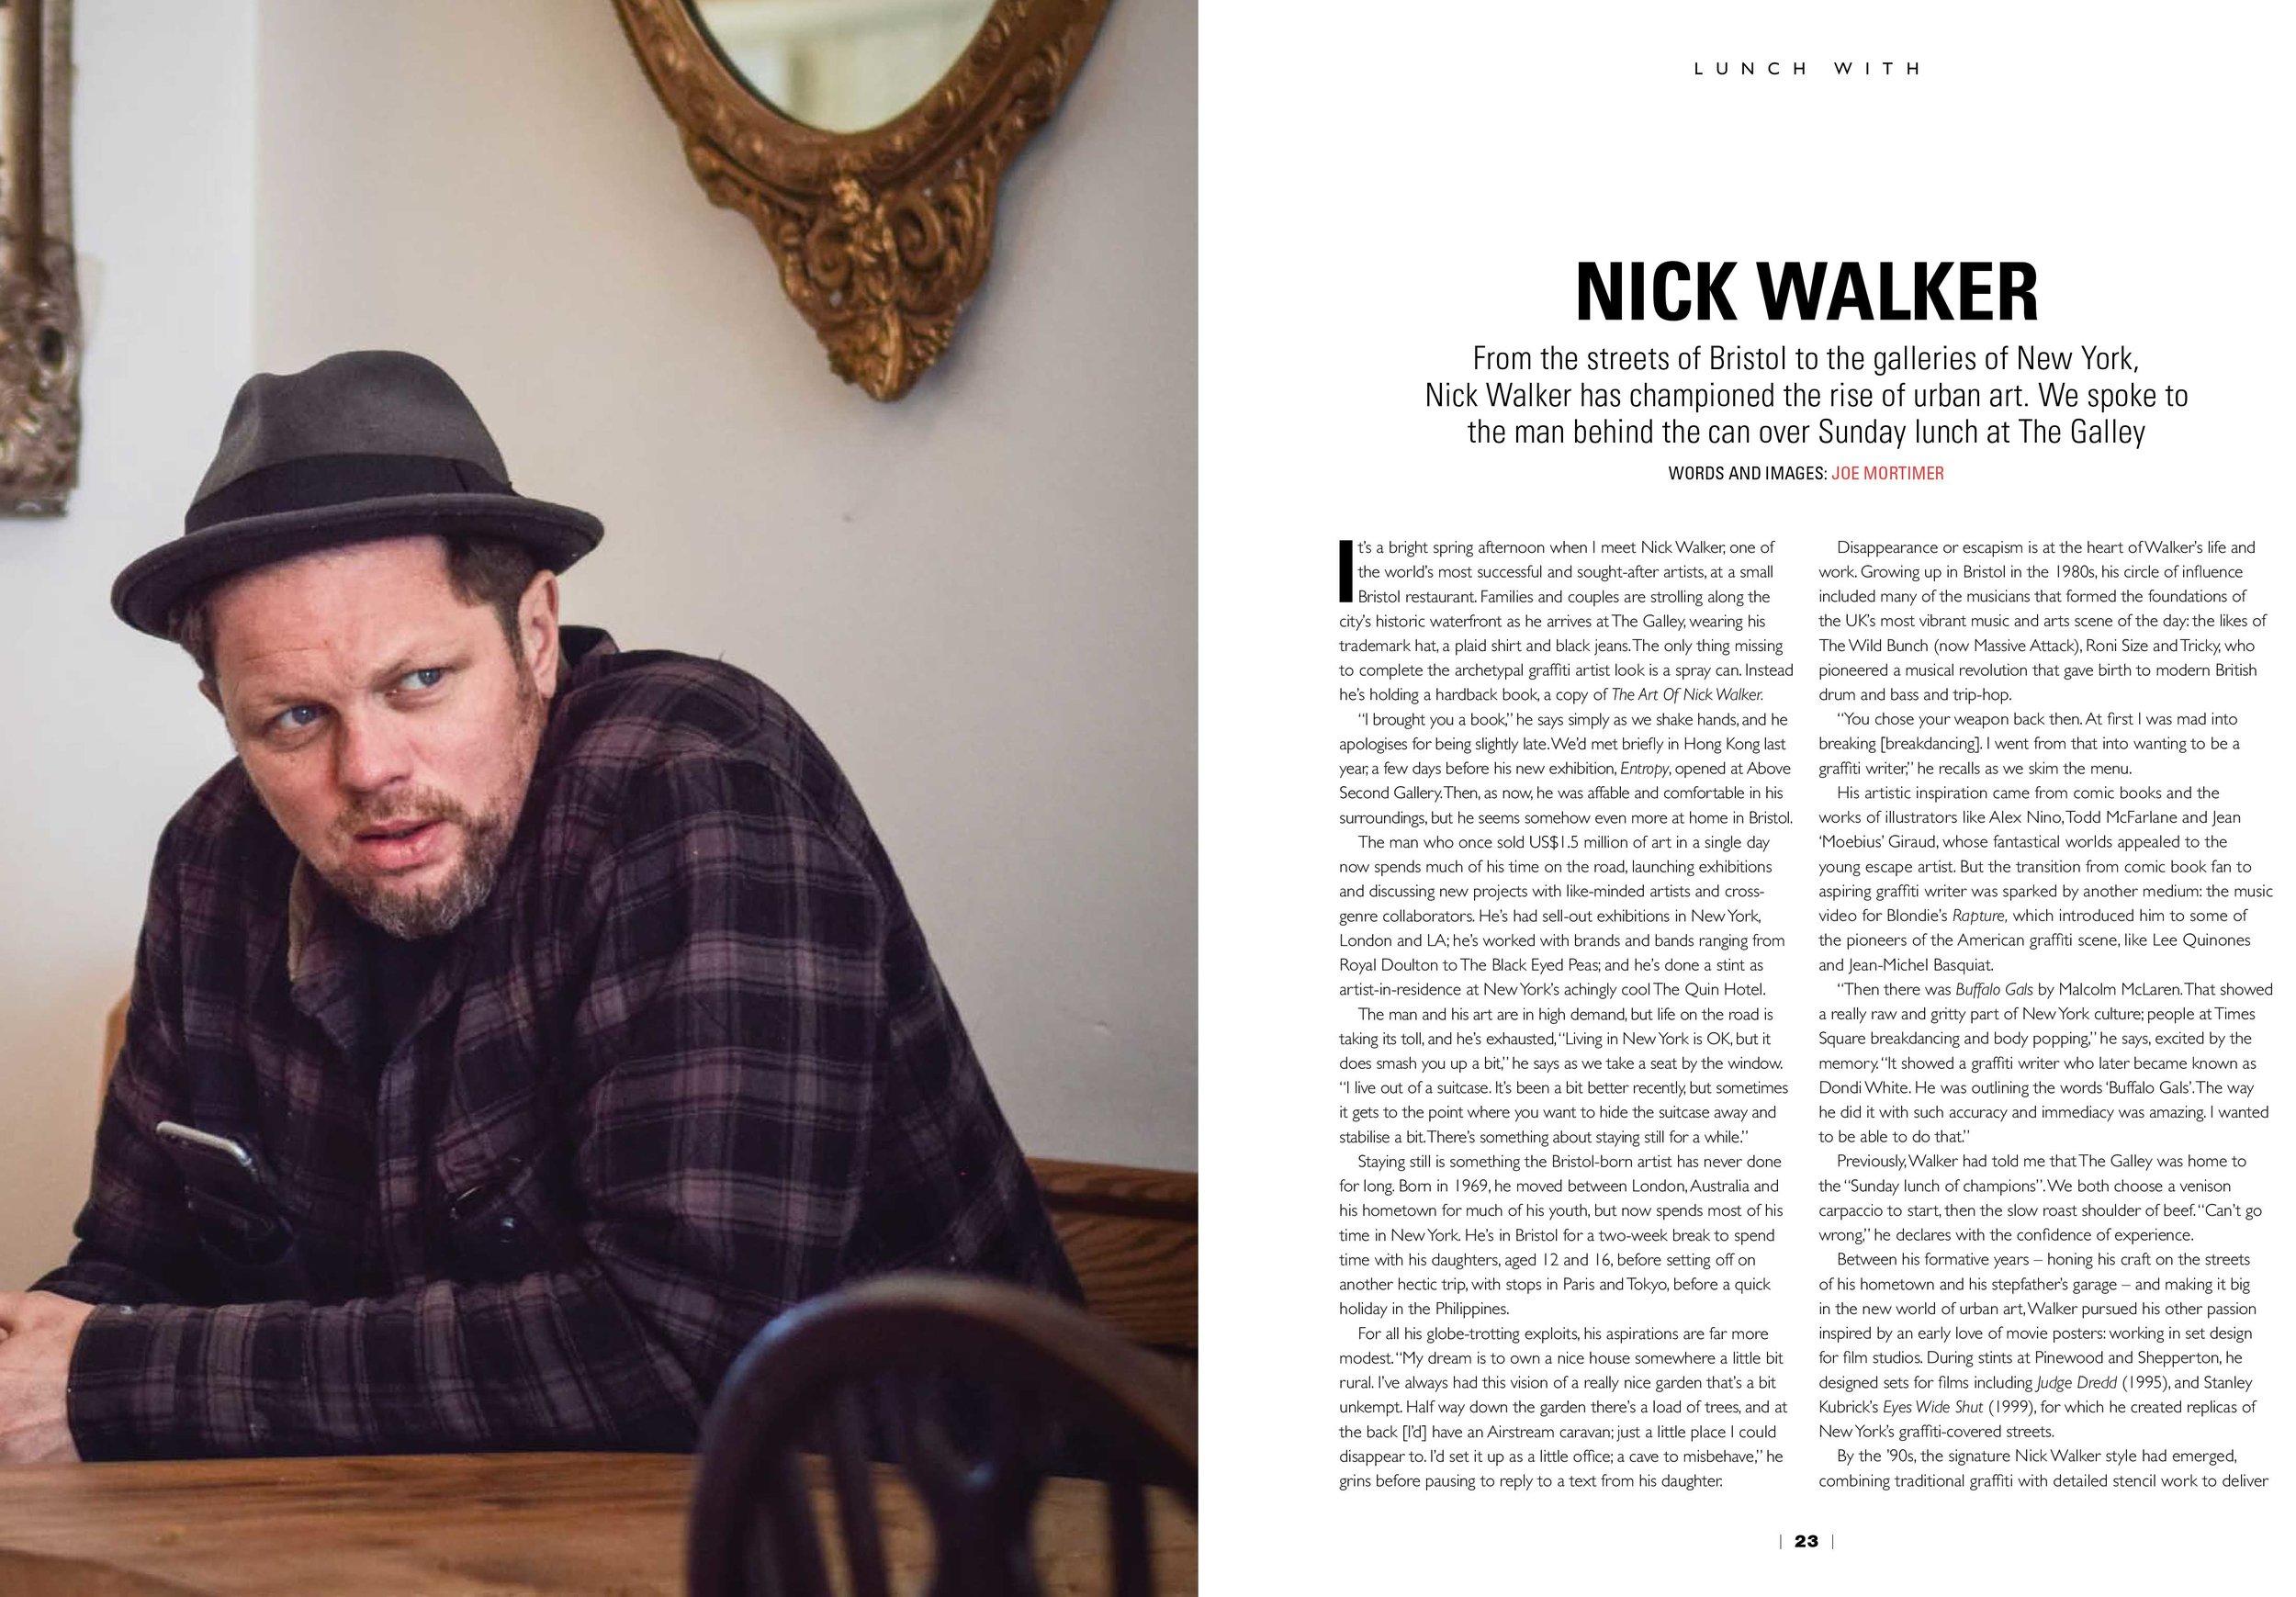 Lunch with Nick Walker, Open Skies